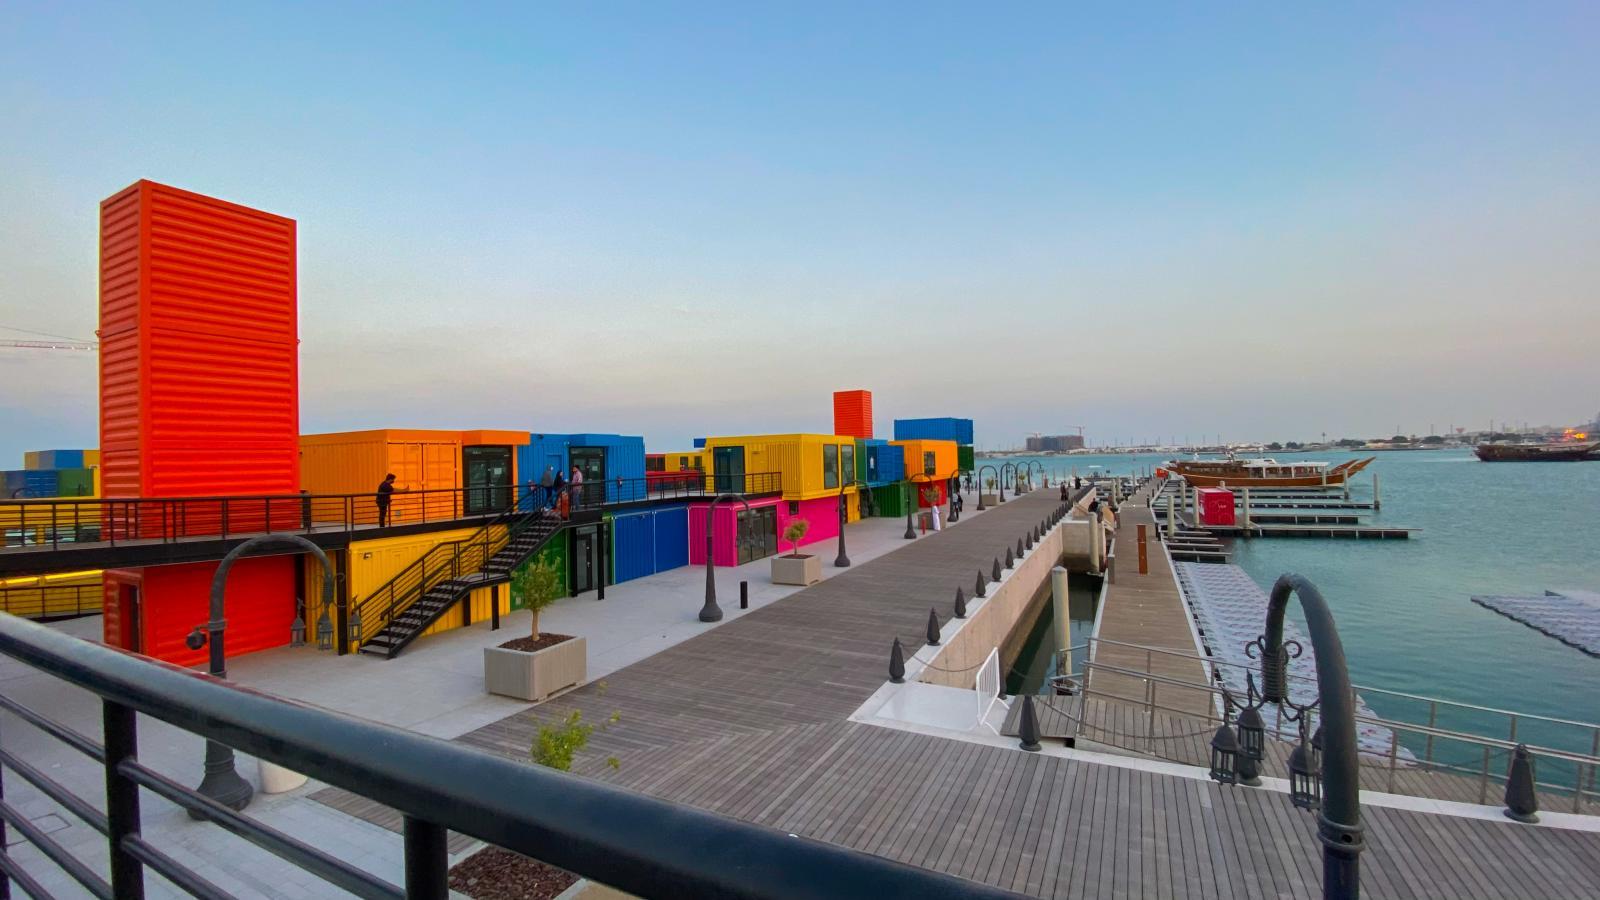 Here's a peek into Qatar's newest Box Park